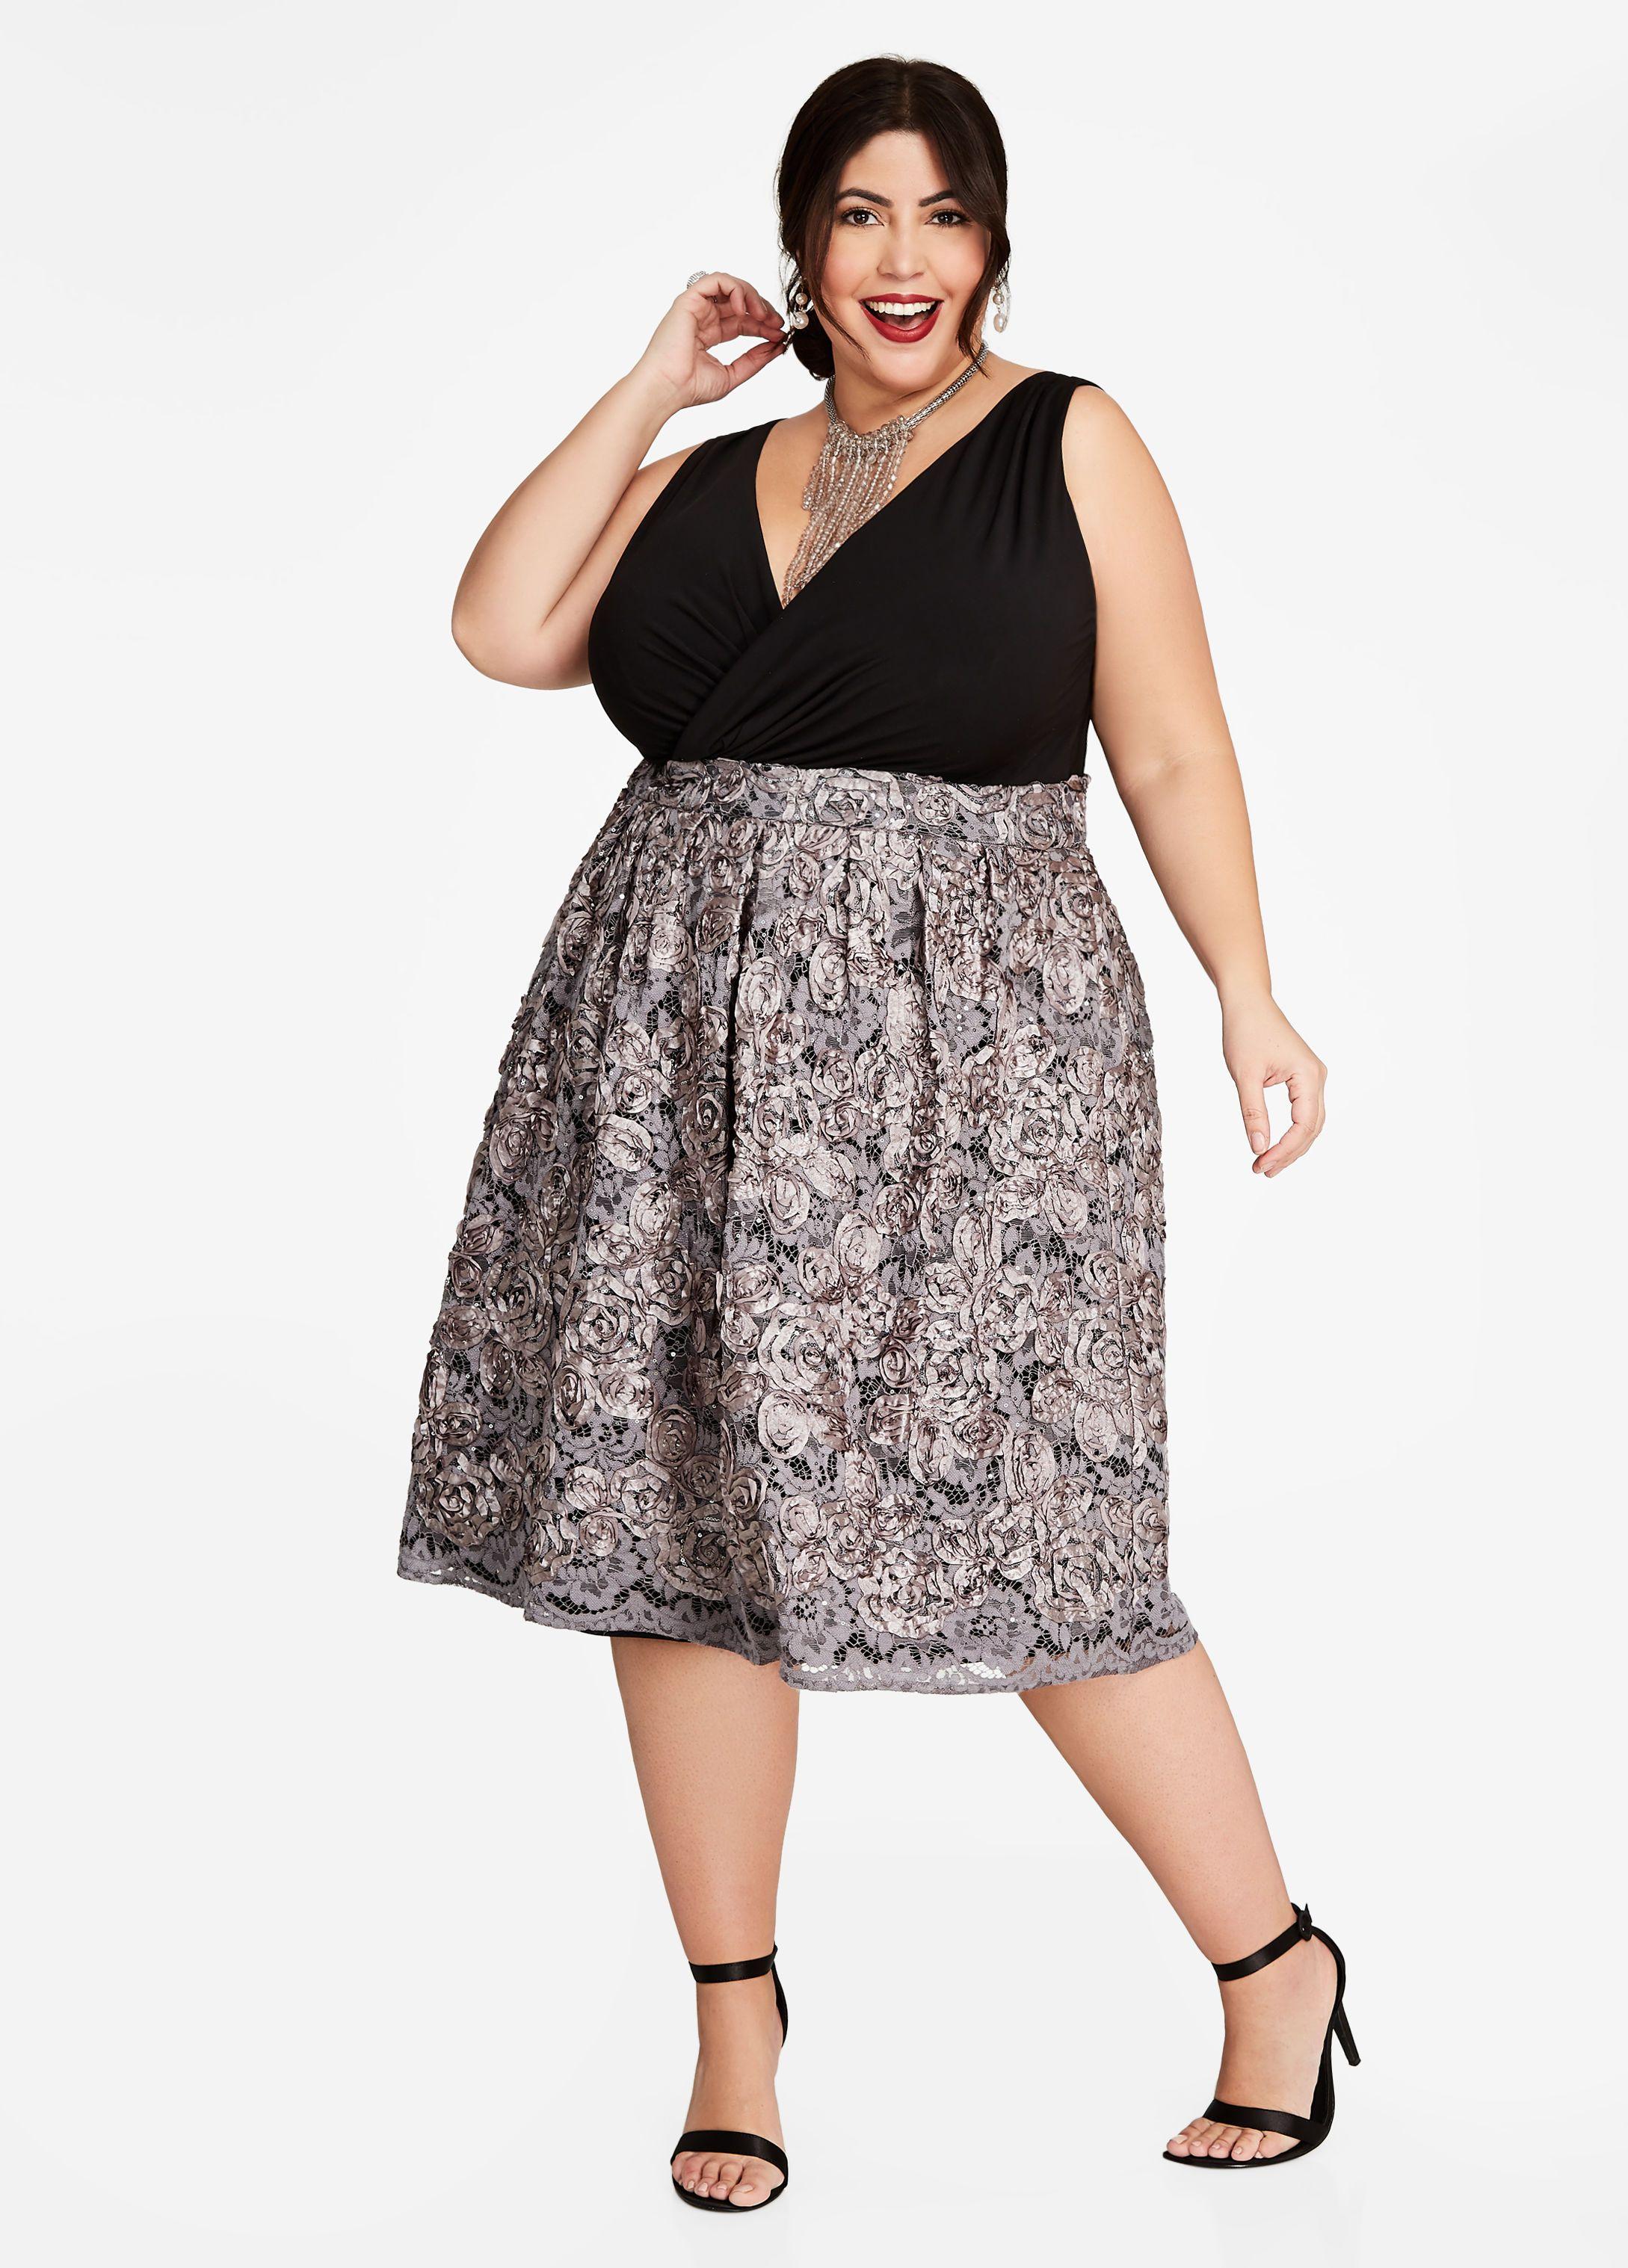 Plus Size Dresses At Ashley Stewart – DACC